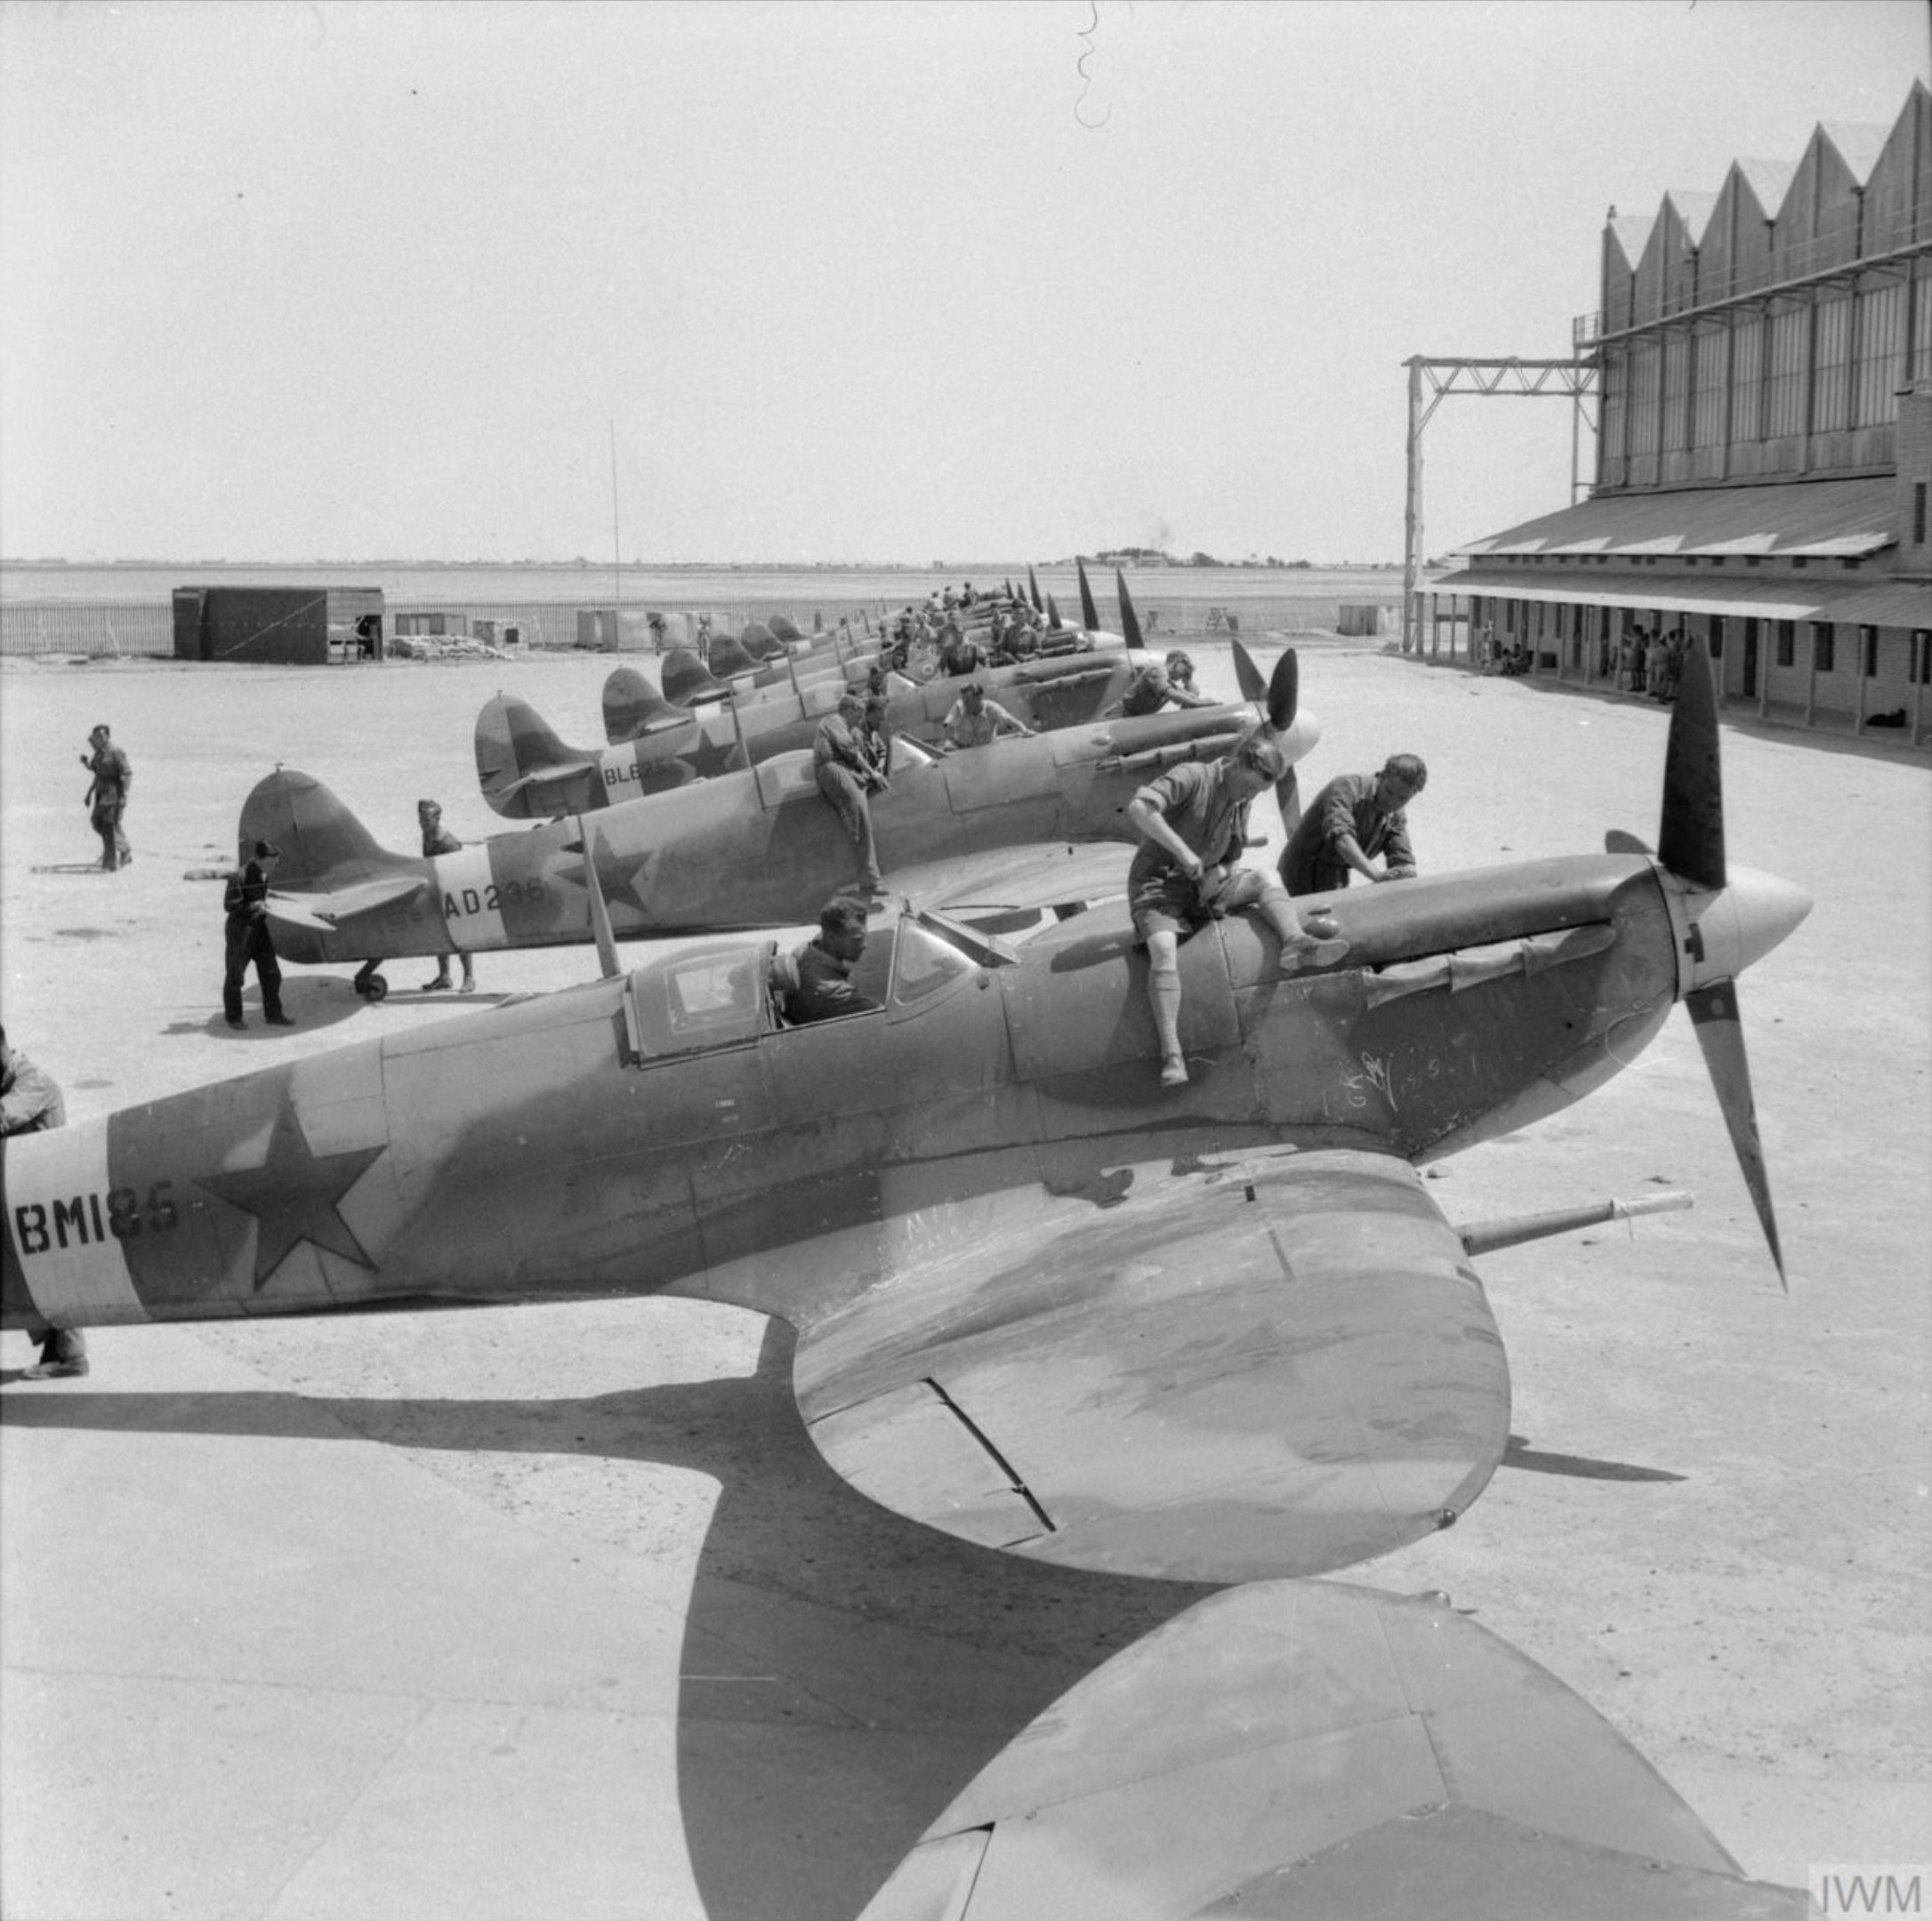 Spitfire MkVb USSR 57GvIAP BM186 AD236 BL625 Abadan Khuzestan 1943 IWM E23983